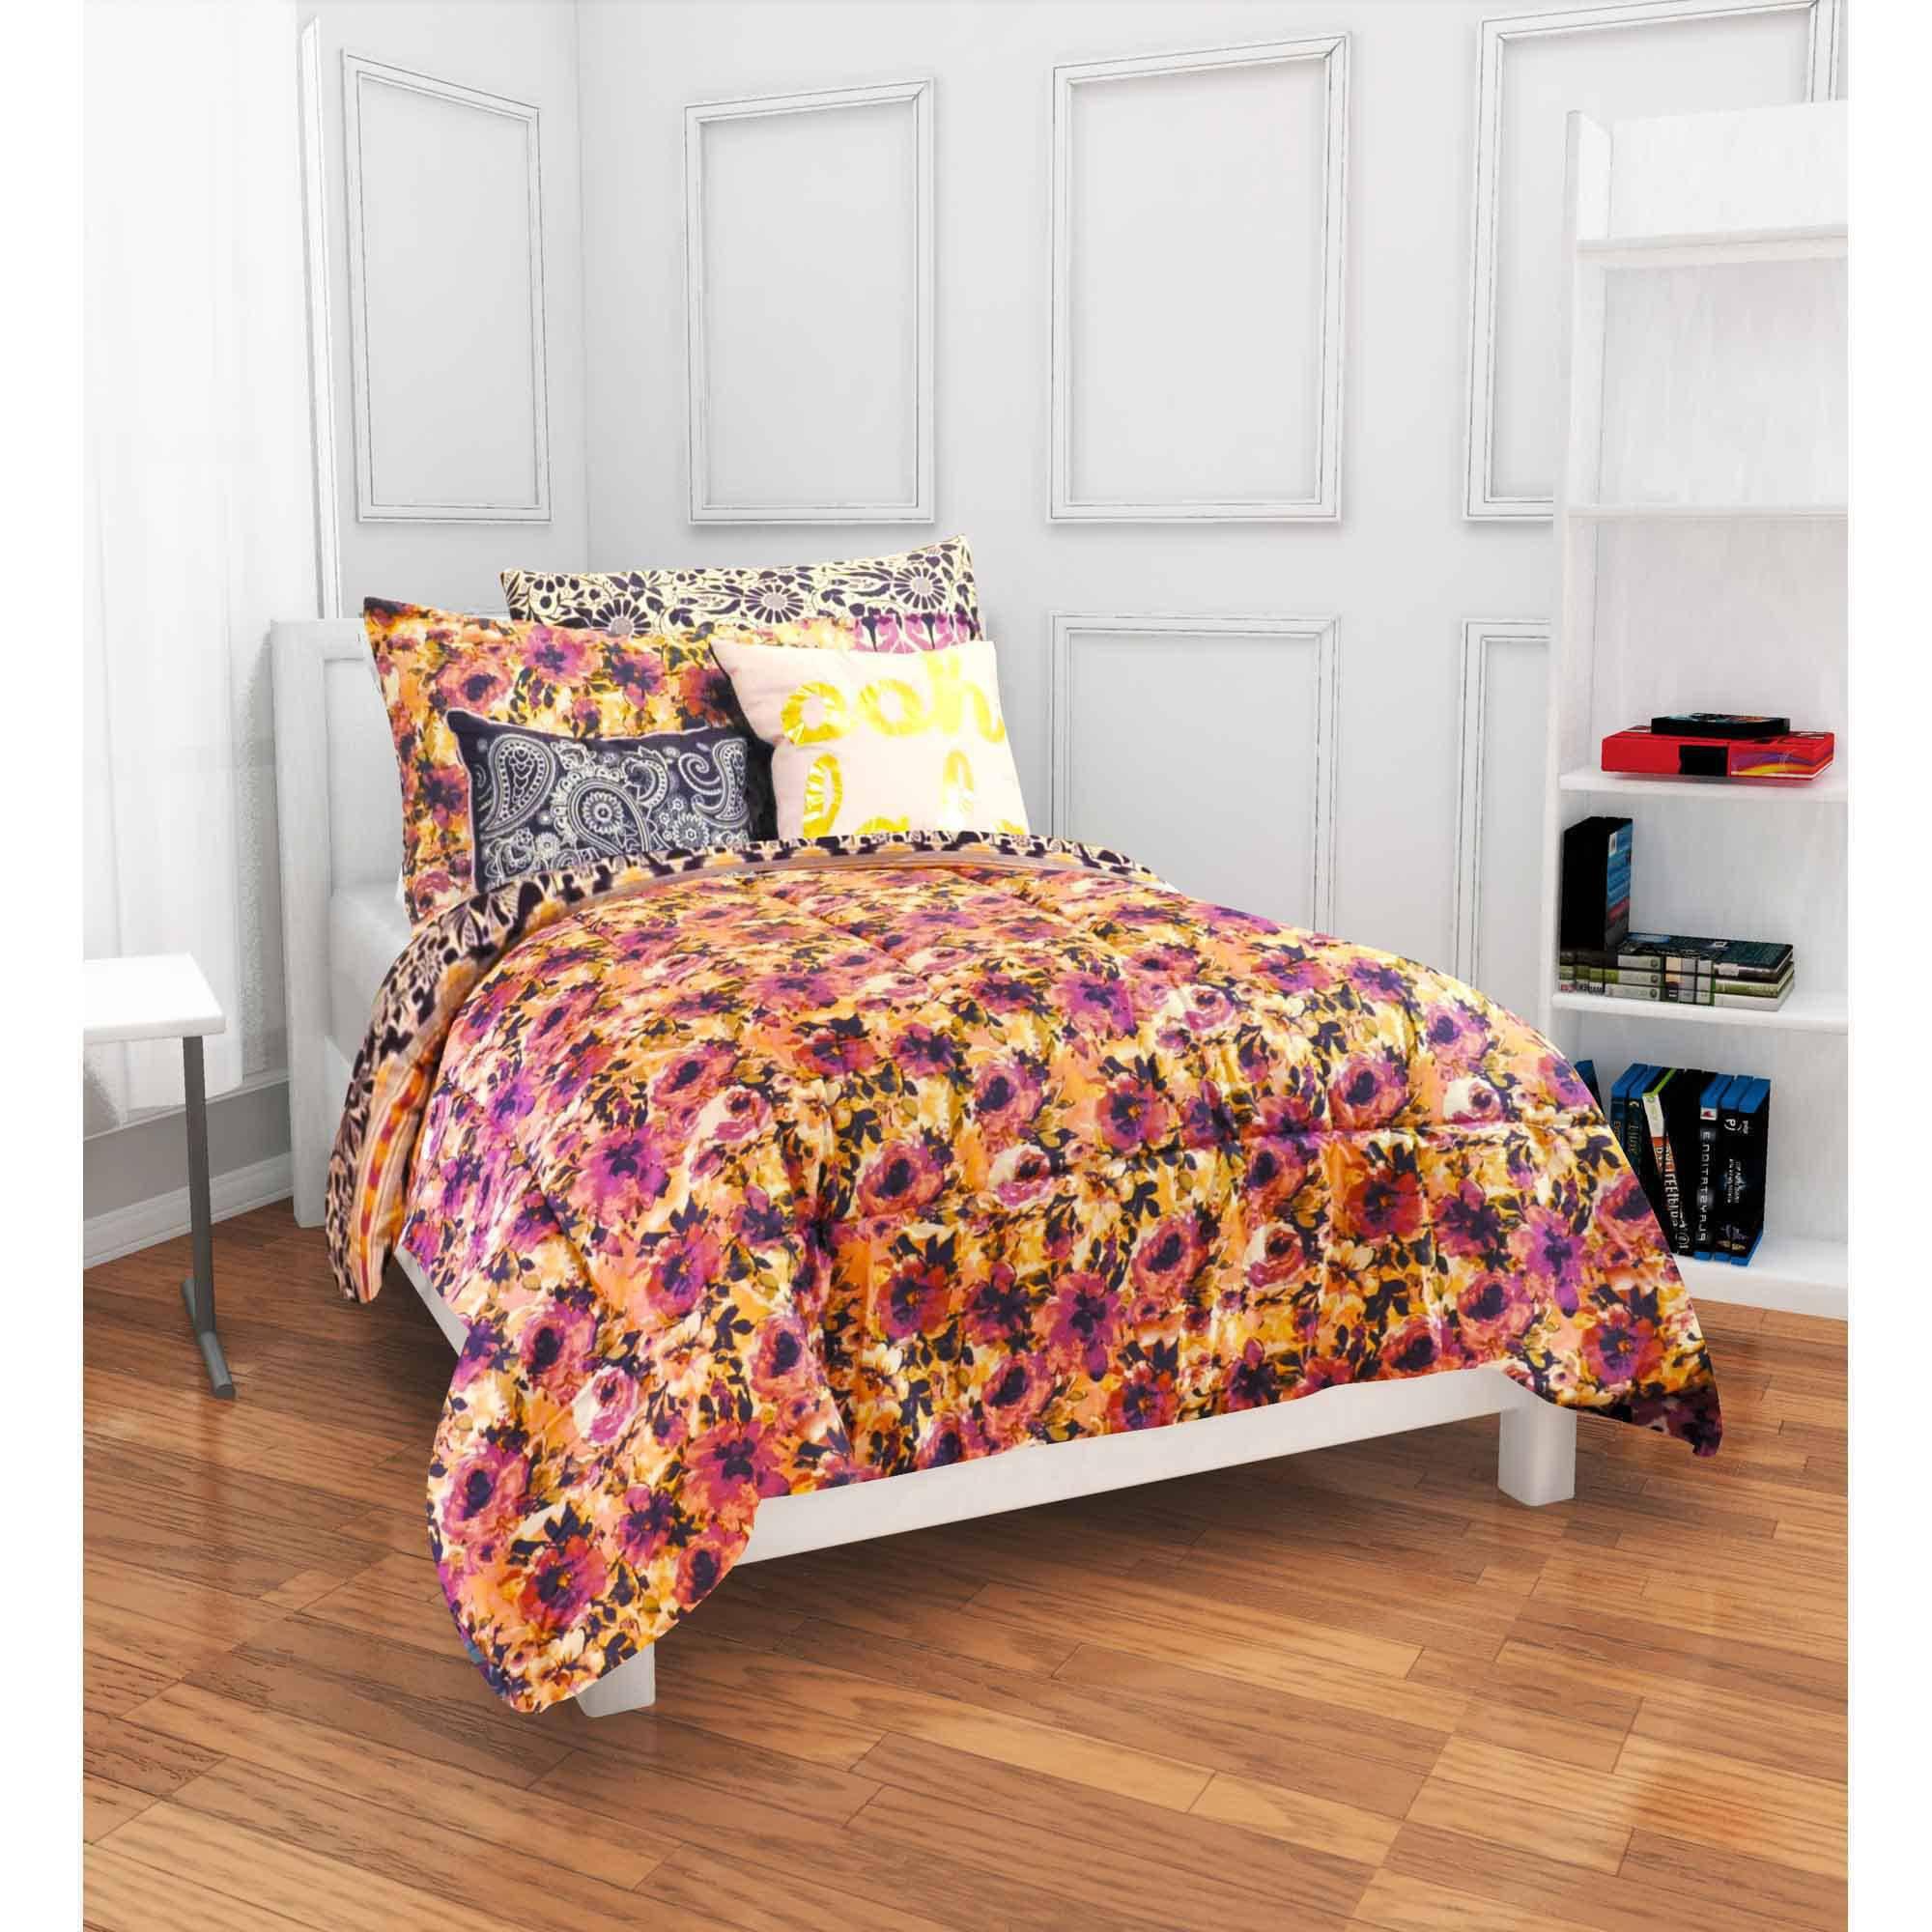 Formula Anna Boho Bed in a Bag Bedding Set, Twin